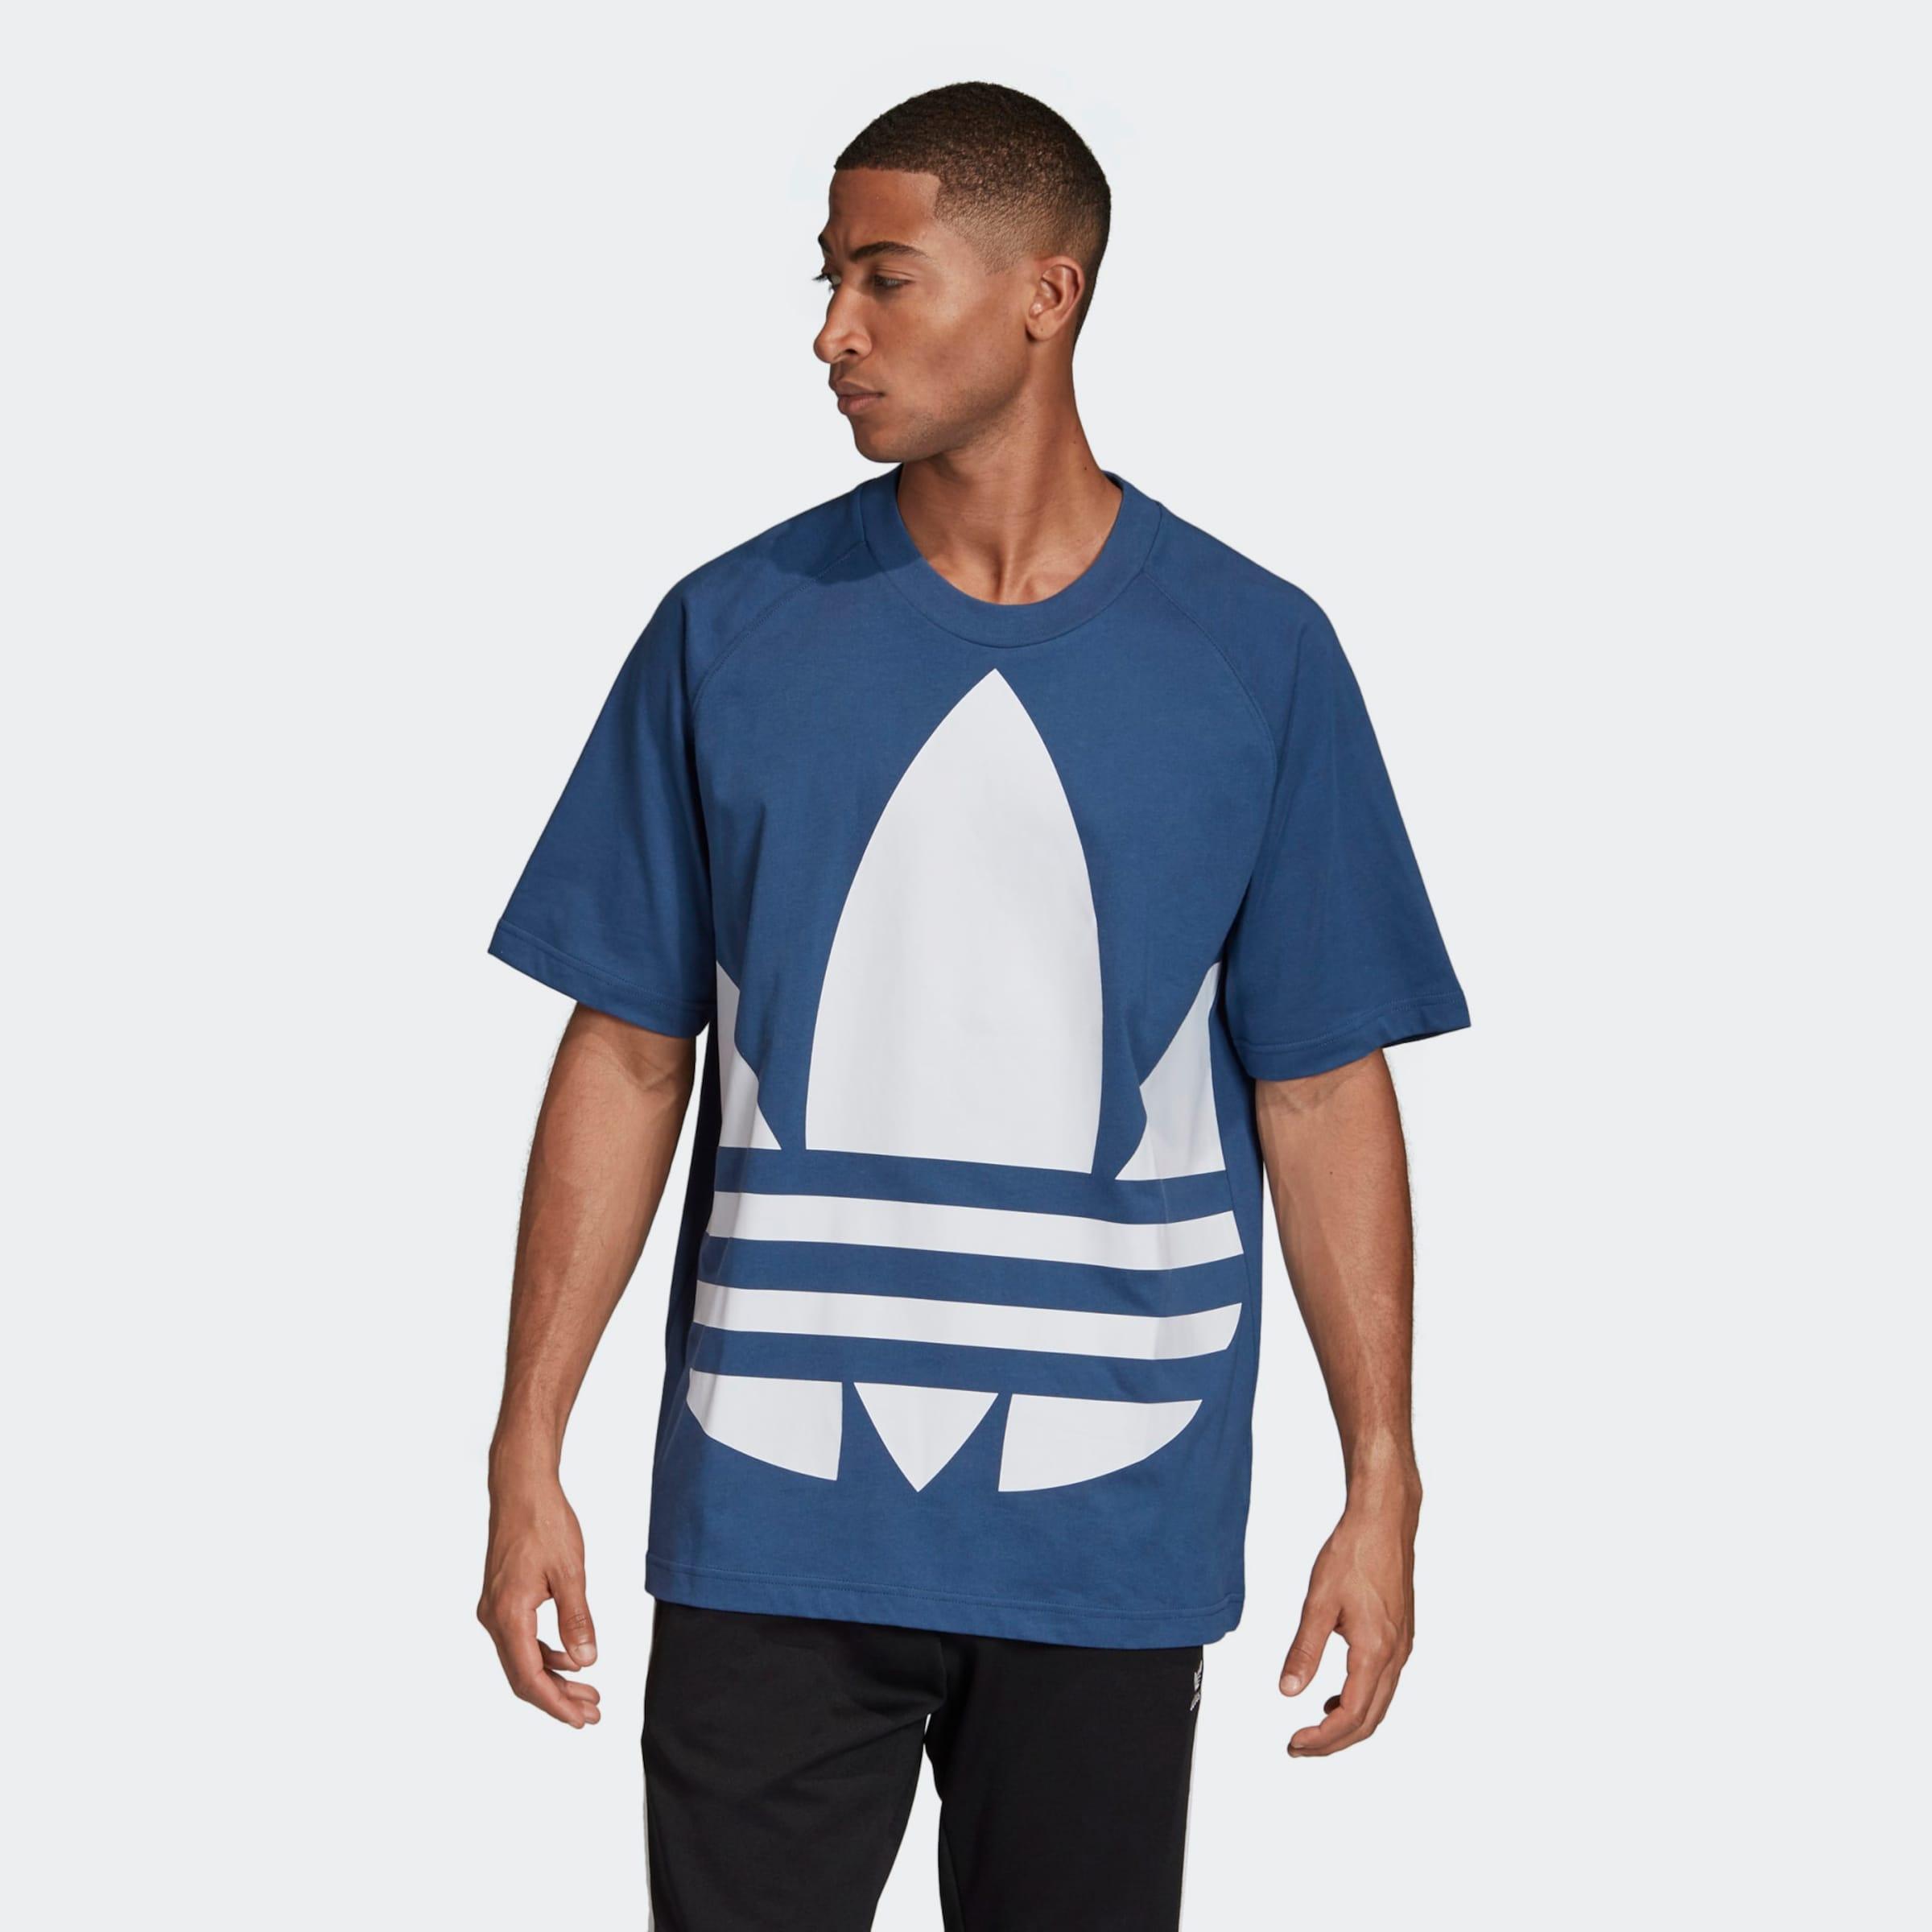 ADIDAS ORIGINALS Shirt 'BG TREFOIL TEE' in blau Logoprint KT495035010